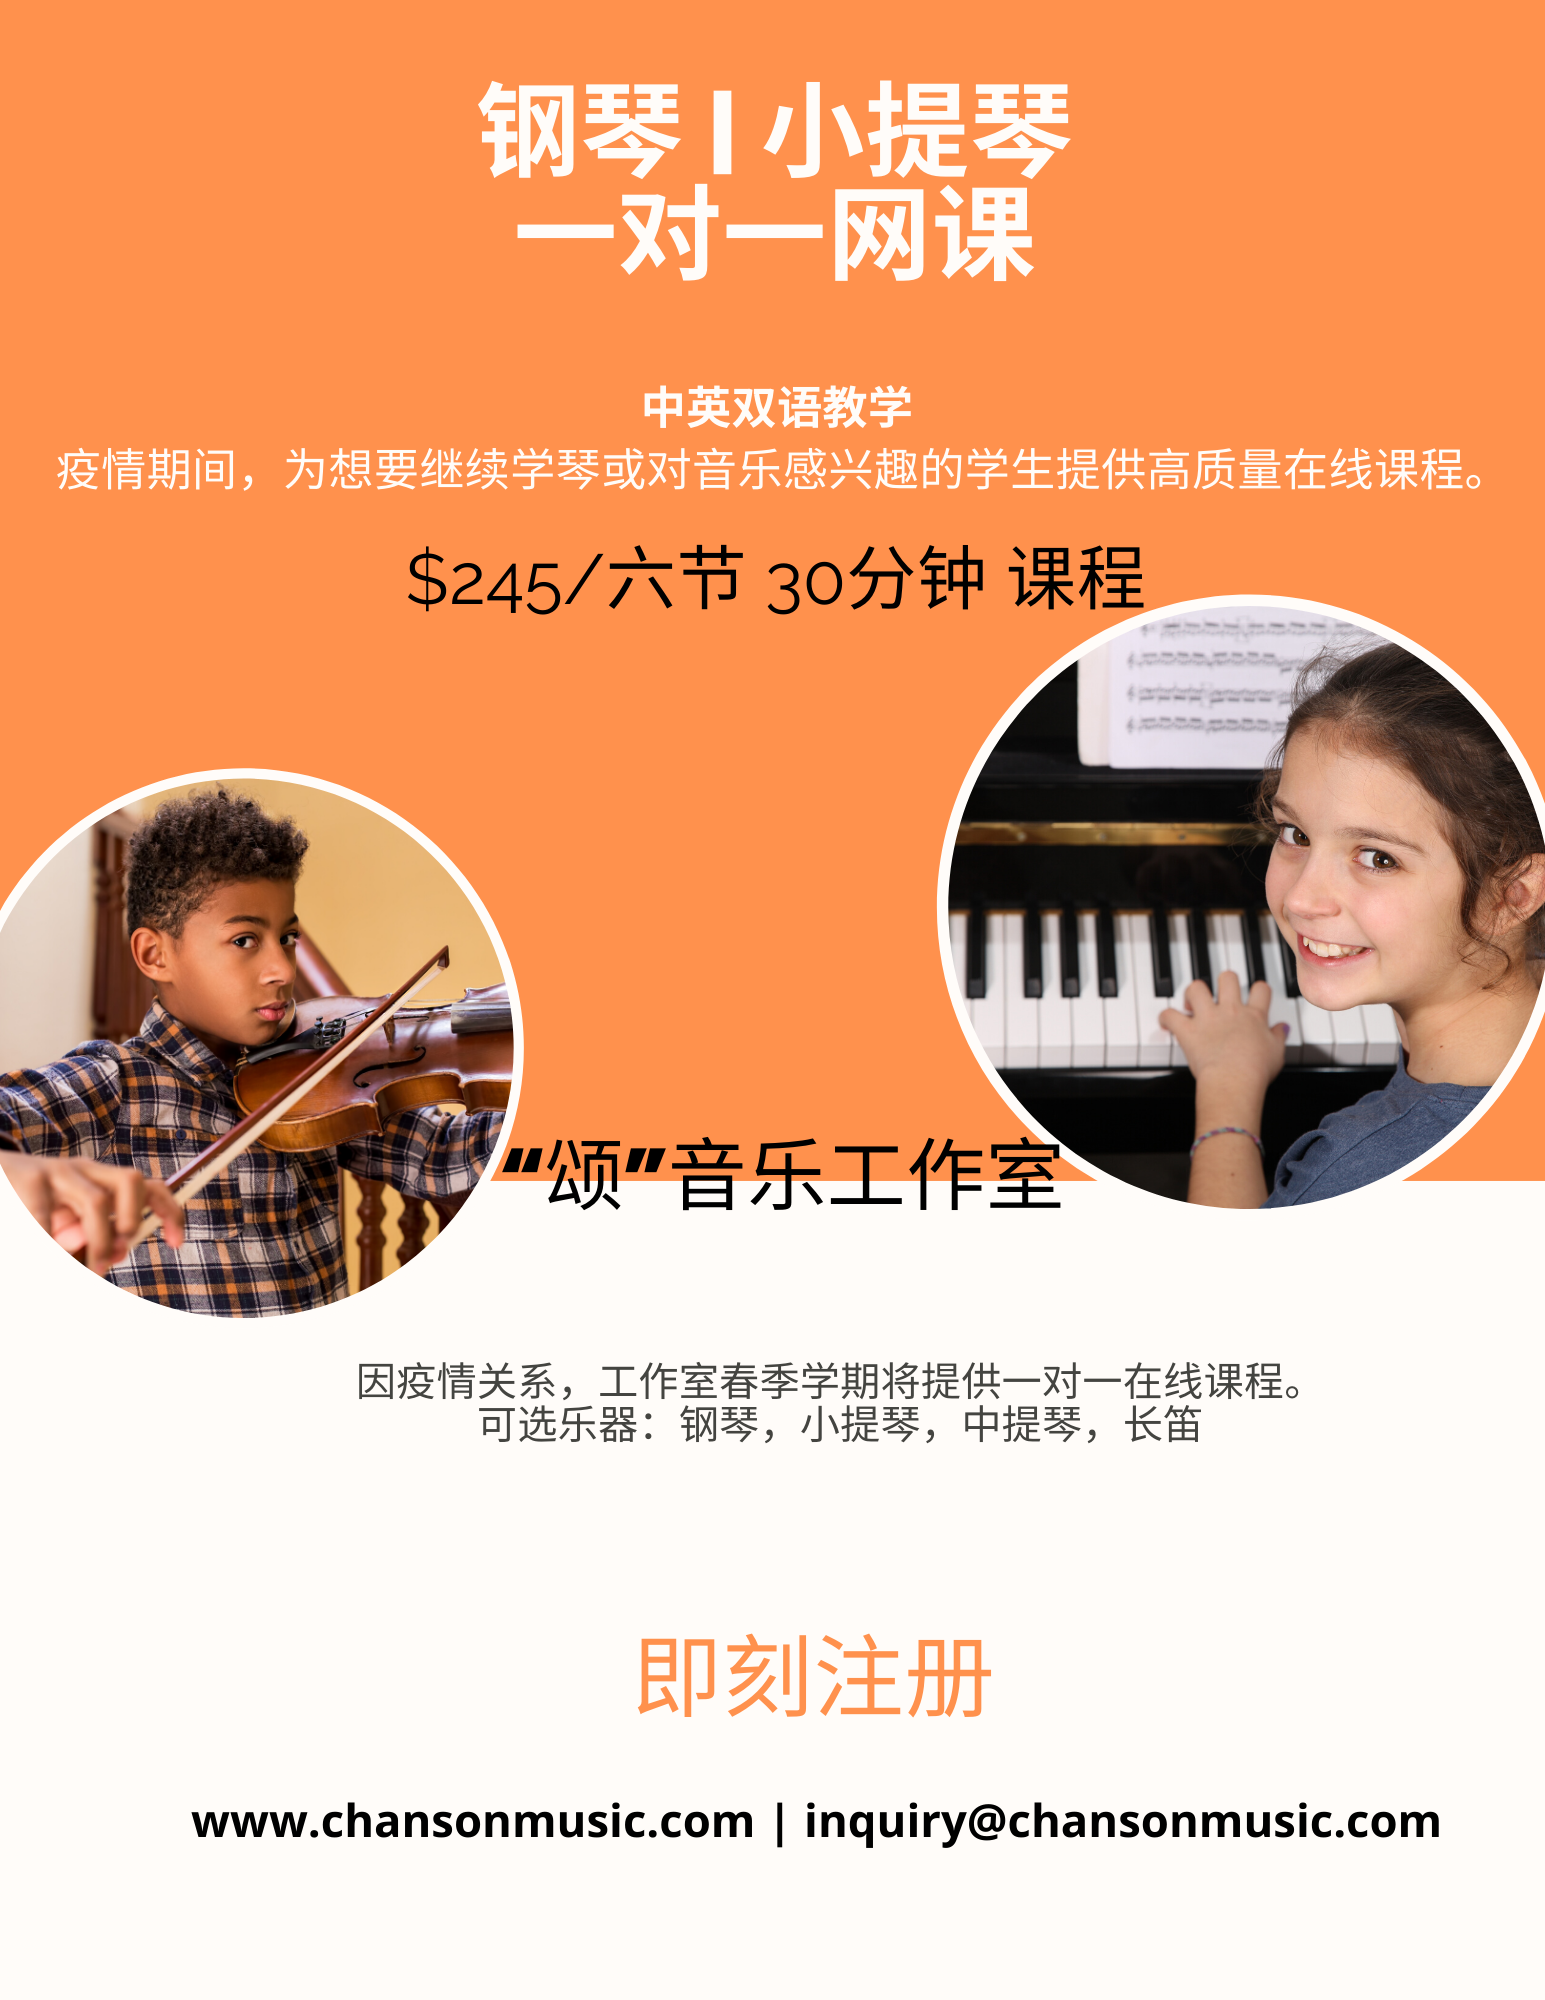 https://www.chansonmusic.com/new-students